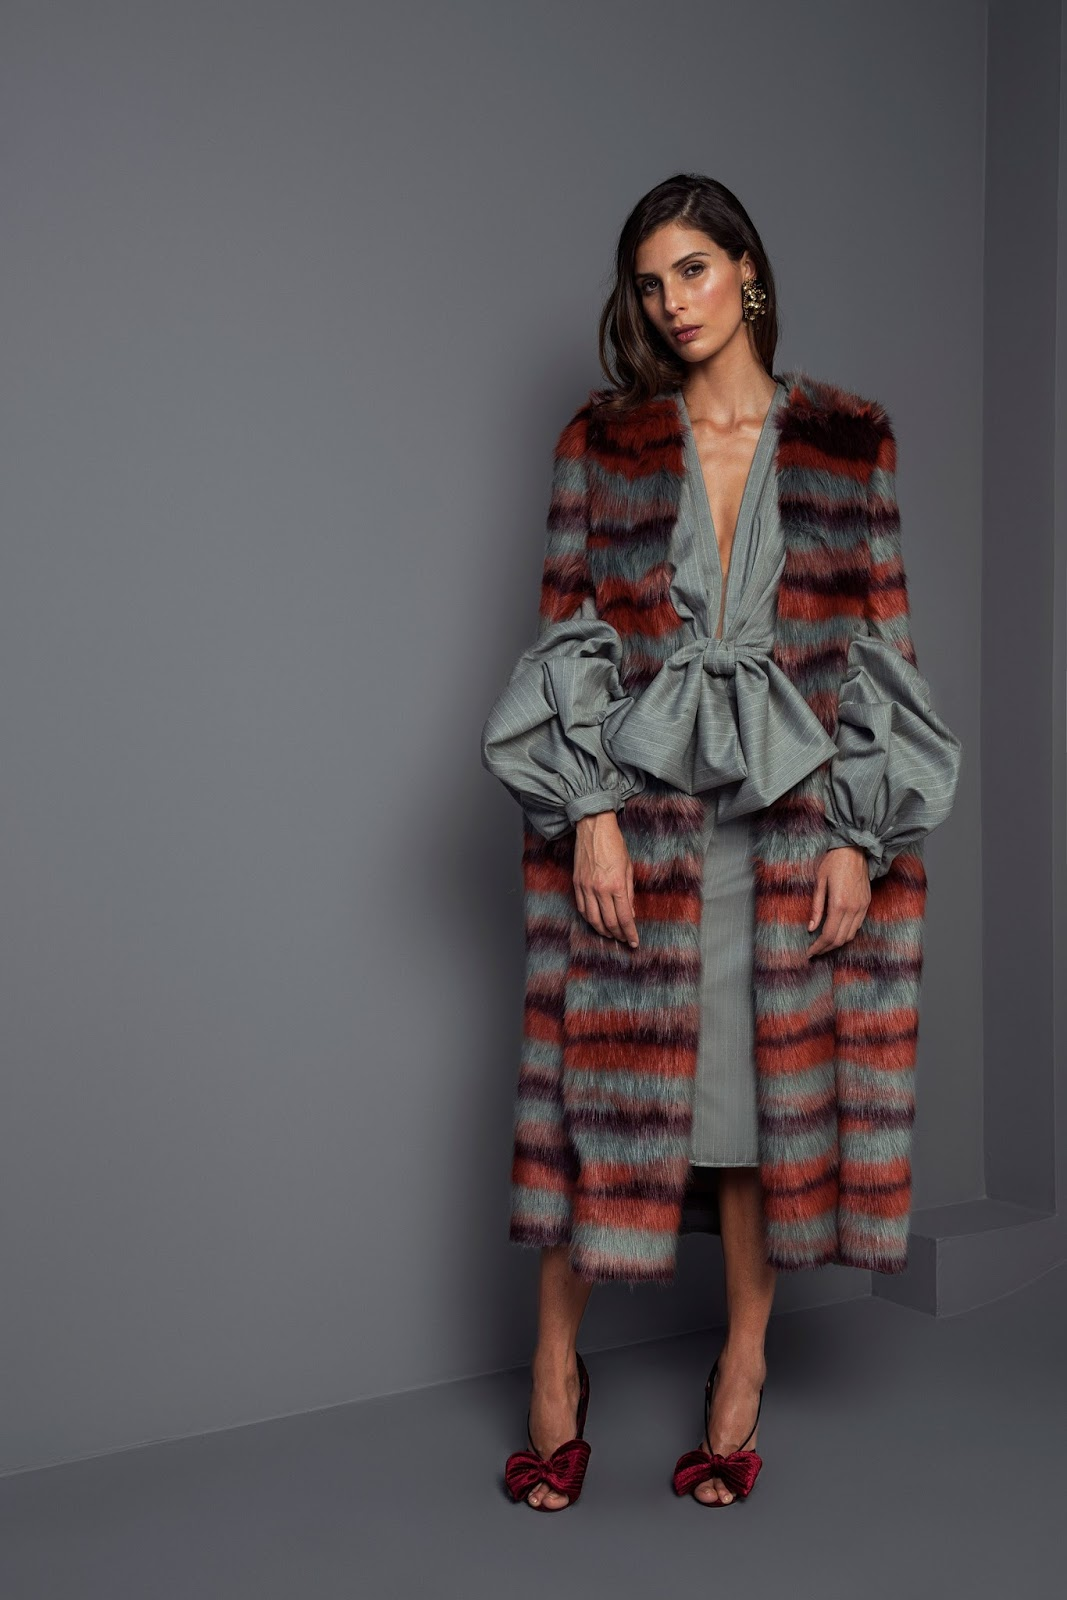 women's clothing johanna ortiz fall 2017